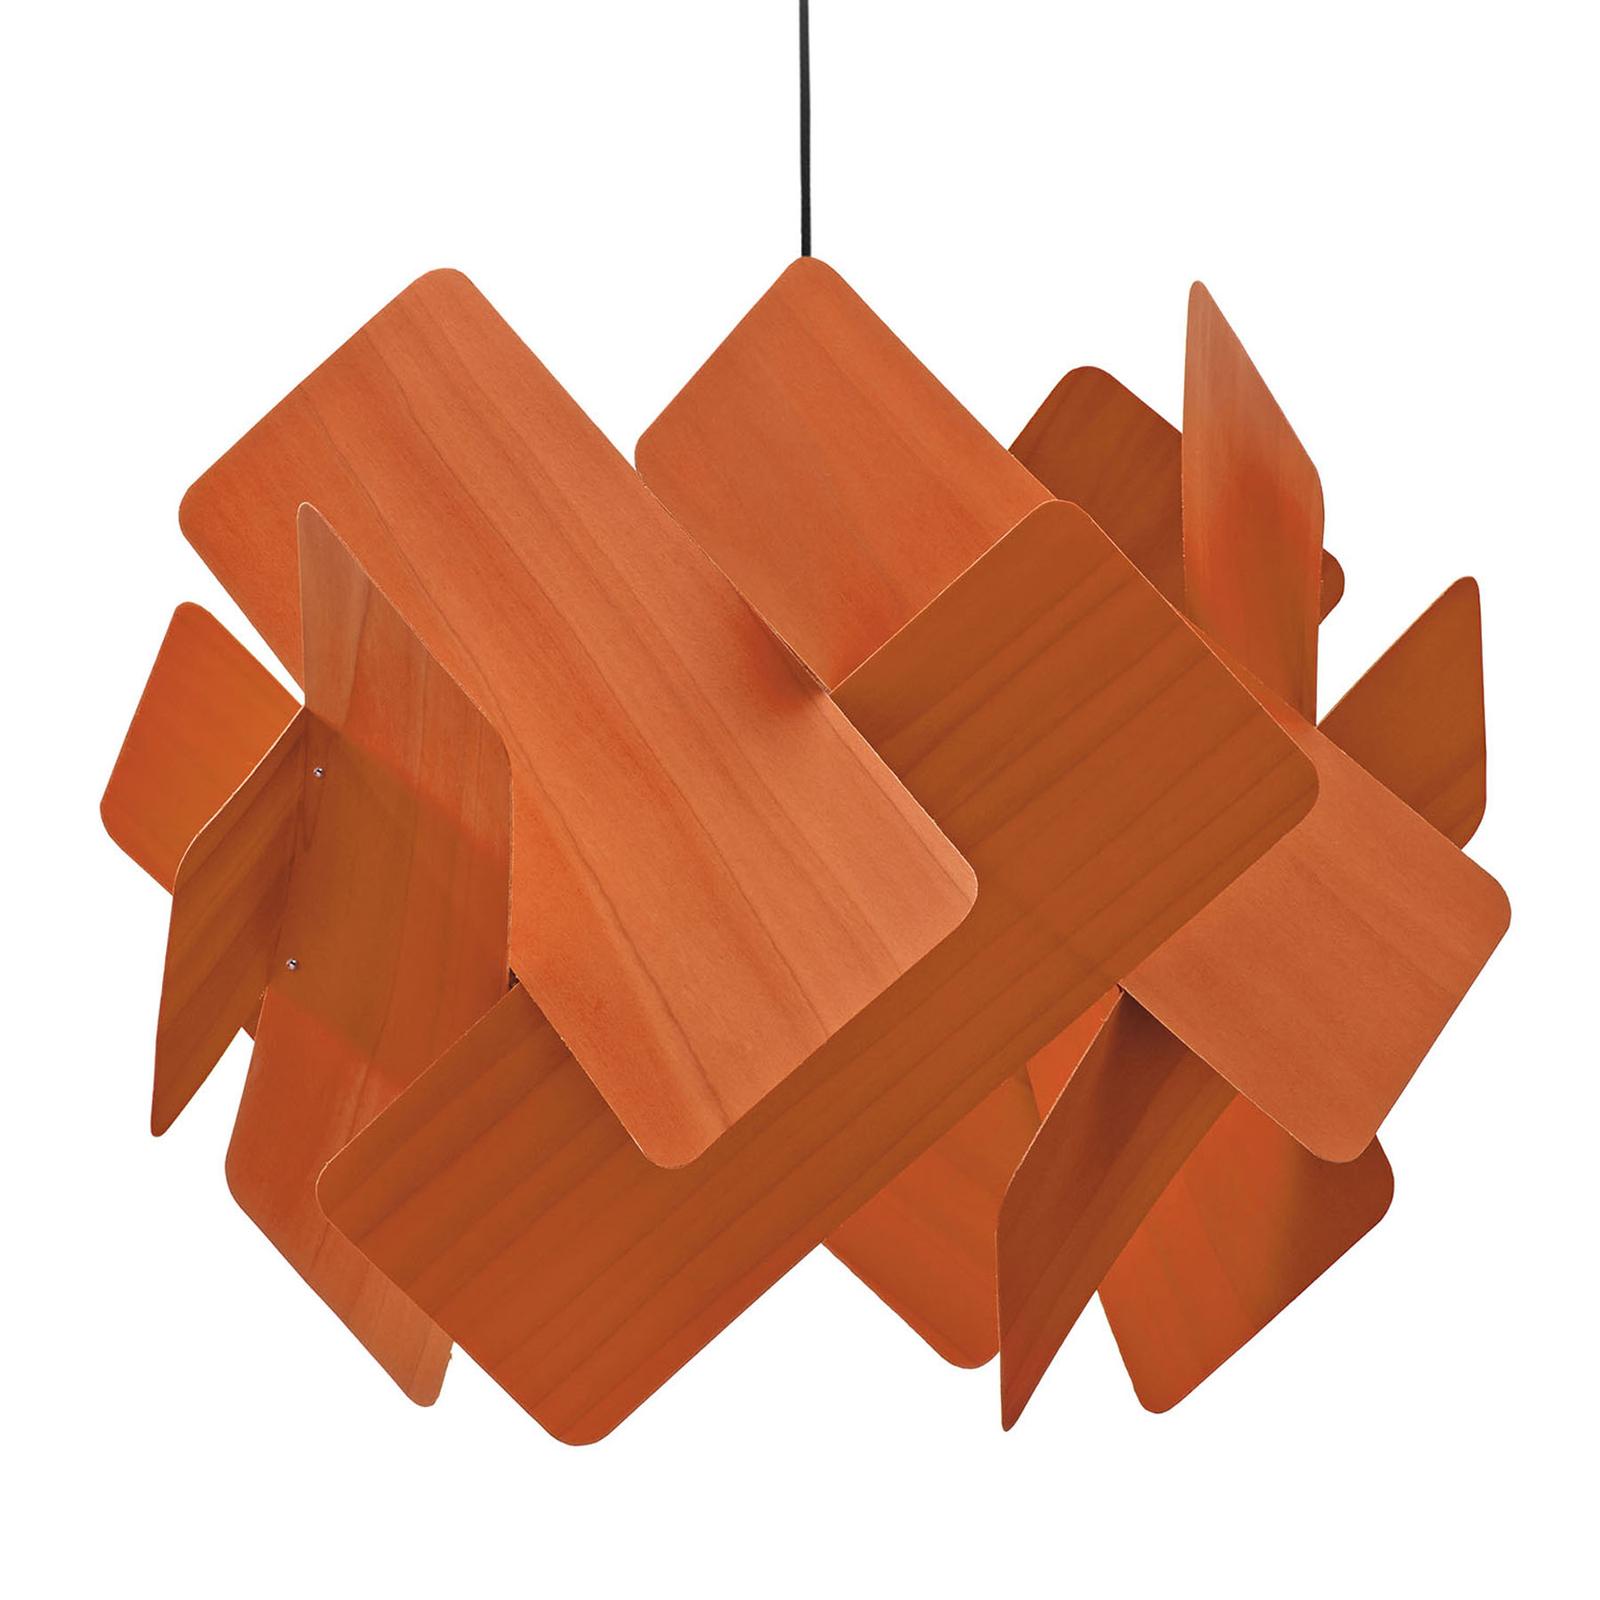 LZF Escape hengelampe, Ø 52 cm, oransje